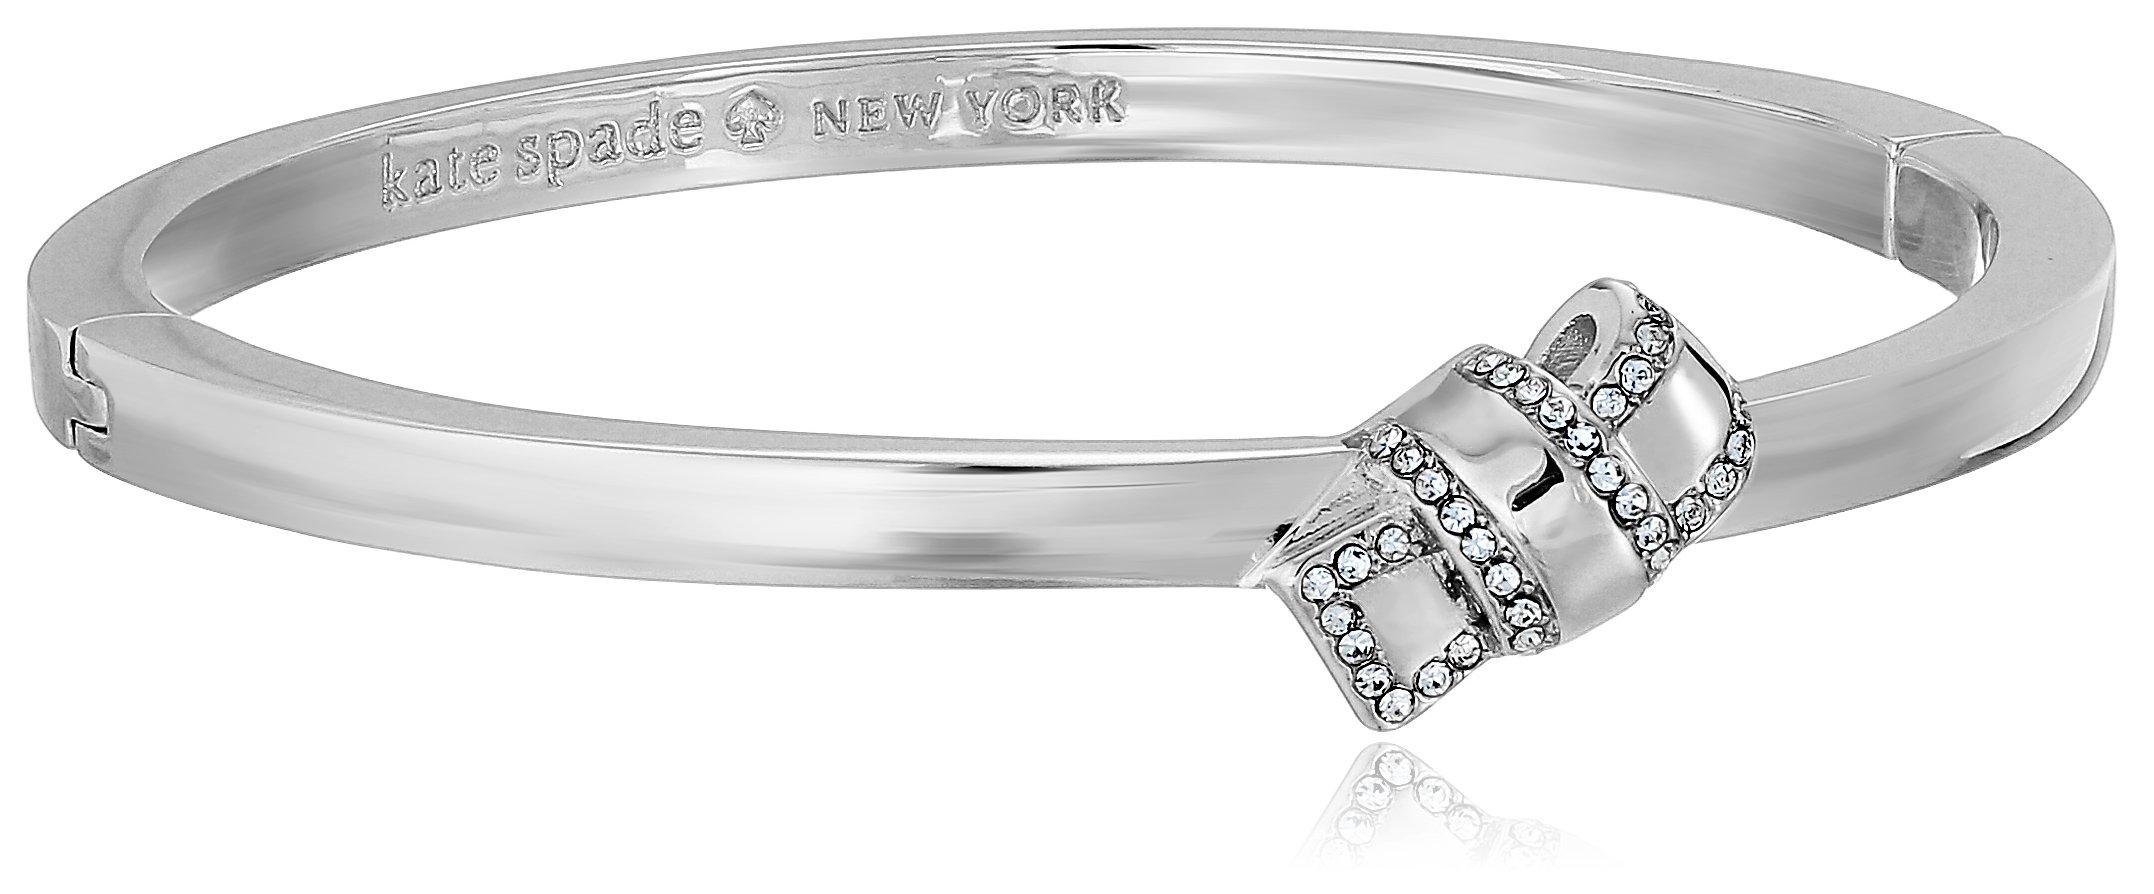 Kate Spade New York Pave Knot Hinged Silver Bangle Bracelet